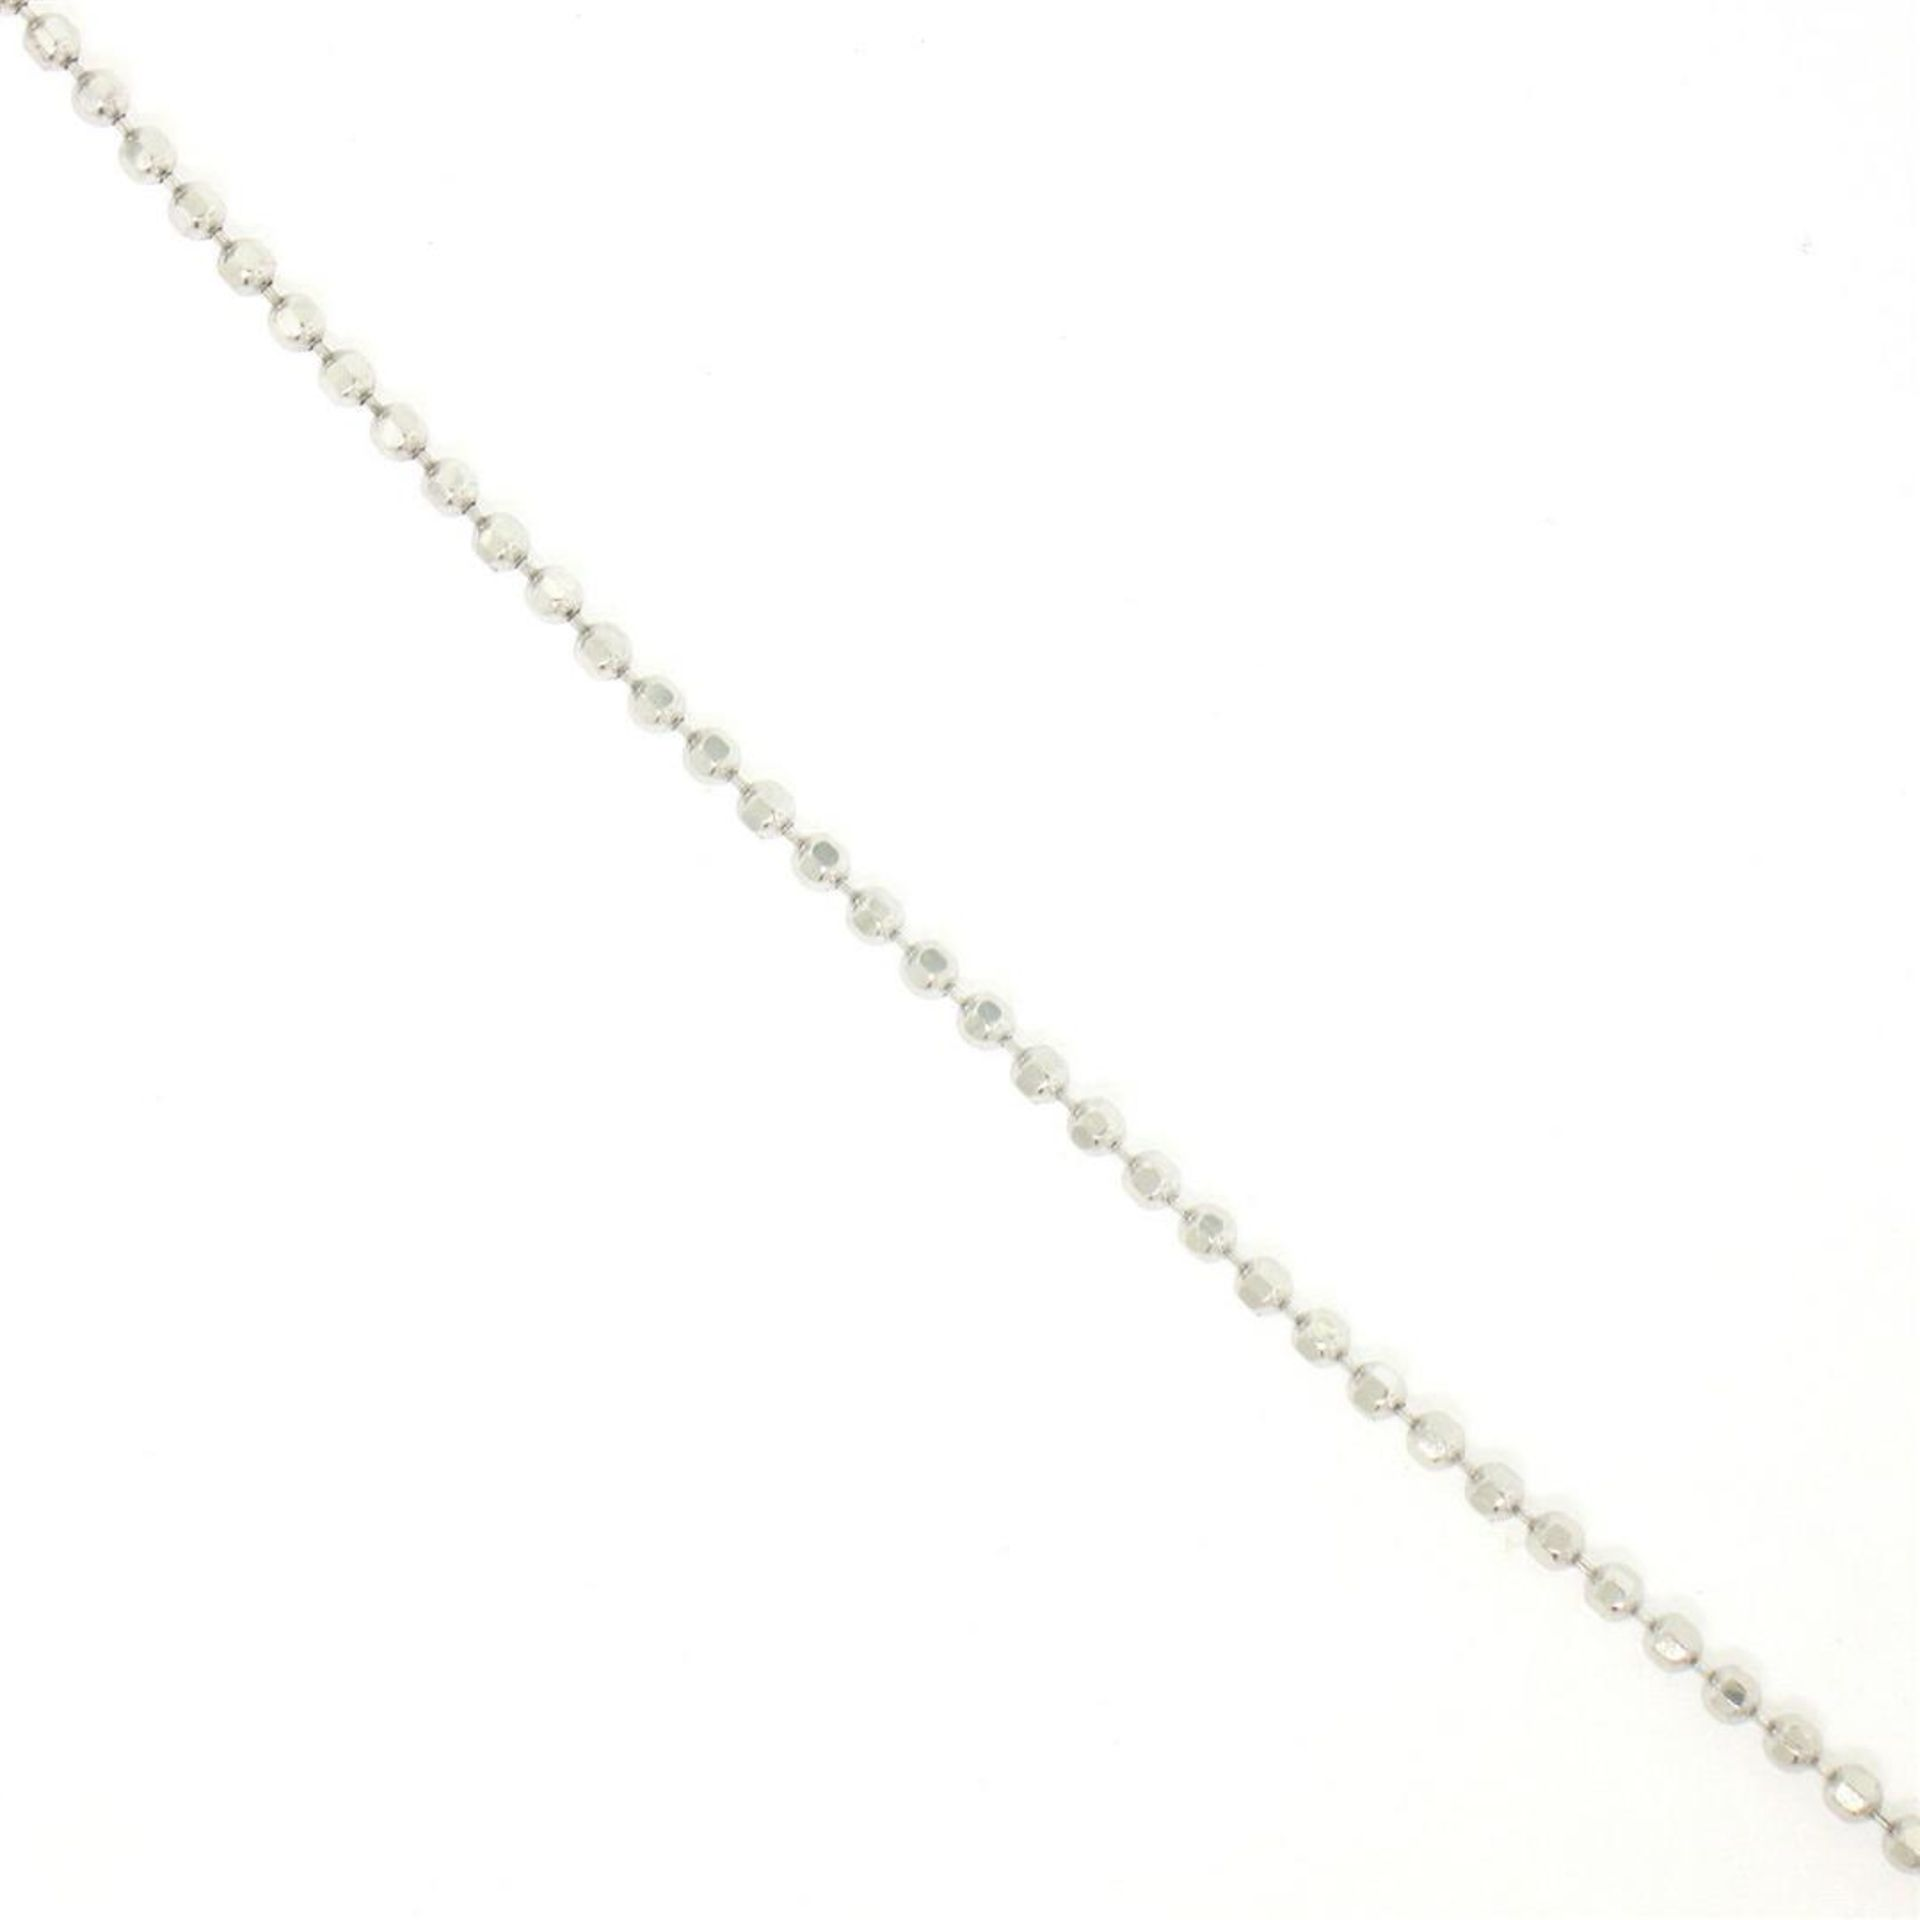 "14k White Gold 0.40 ctw Round Brilliant Diamond Open Heart Pendant 18"" Bead Chai - Image 6 of 7"